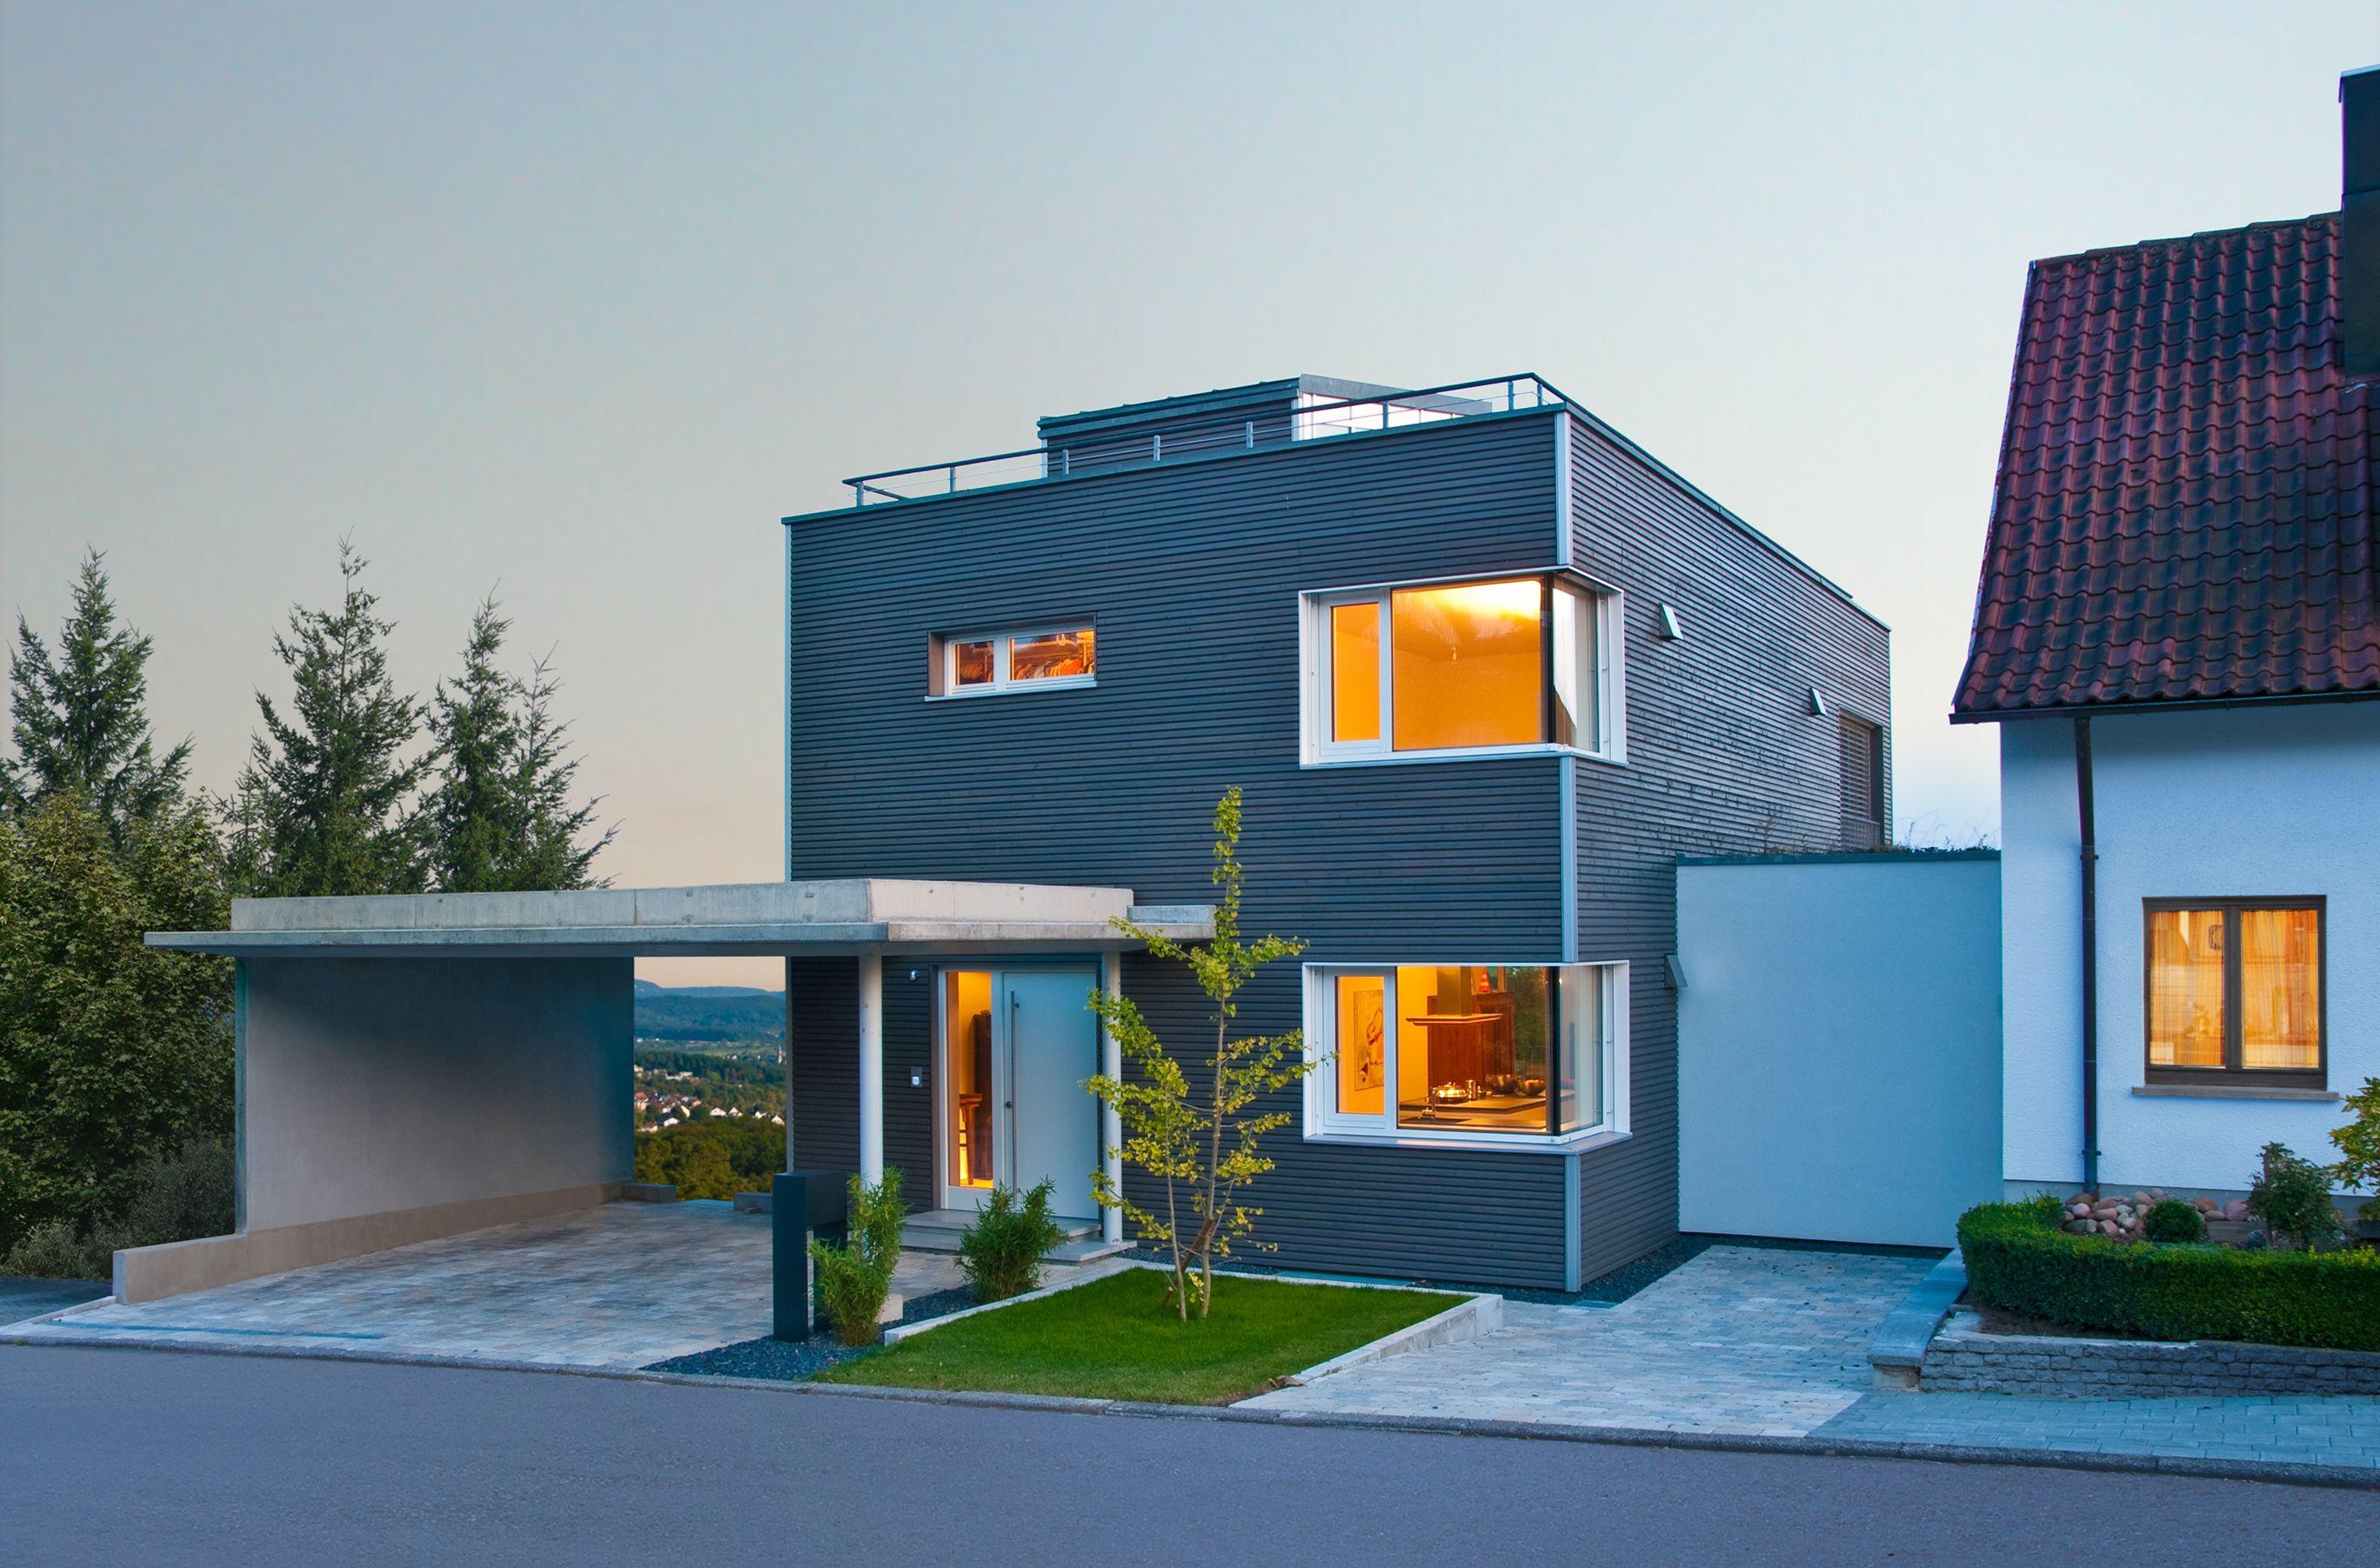 billige fertighuser fertighuser sterreich billig standard. Black Bedroom Furniture Sets. Home Design Ideas